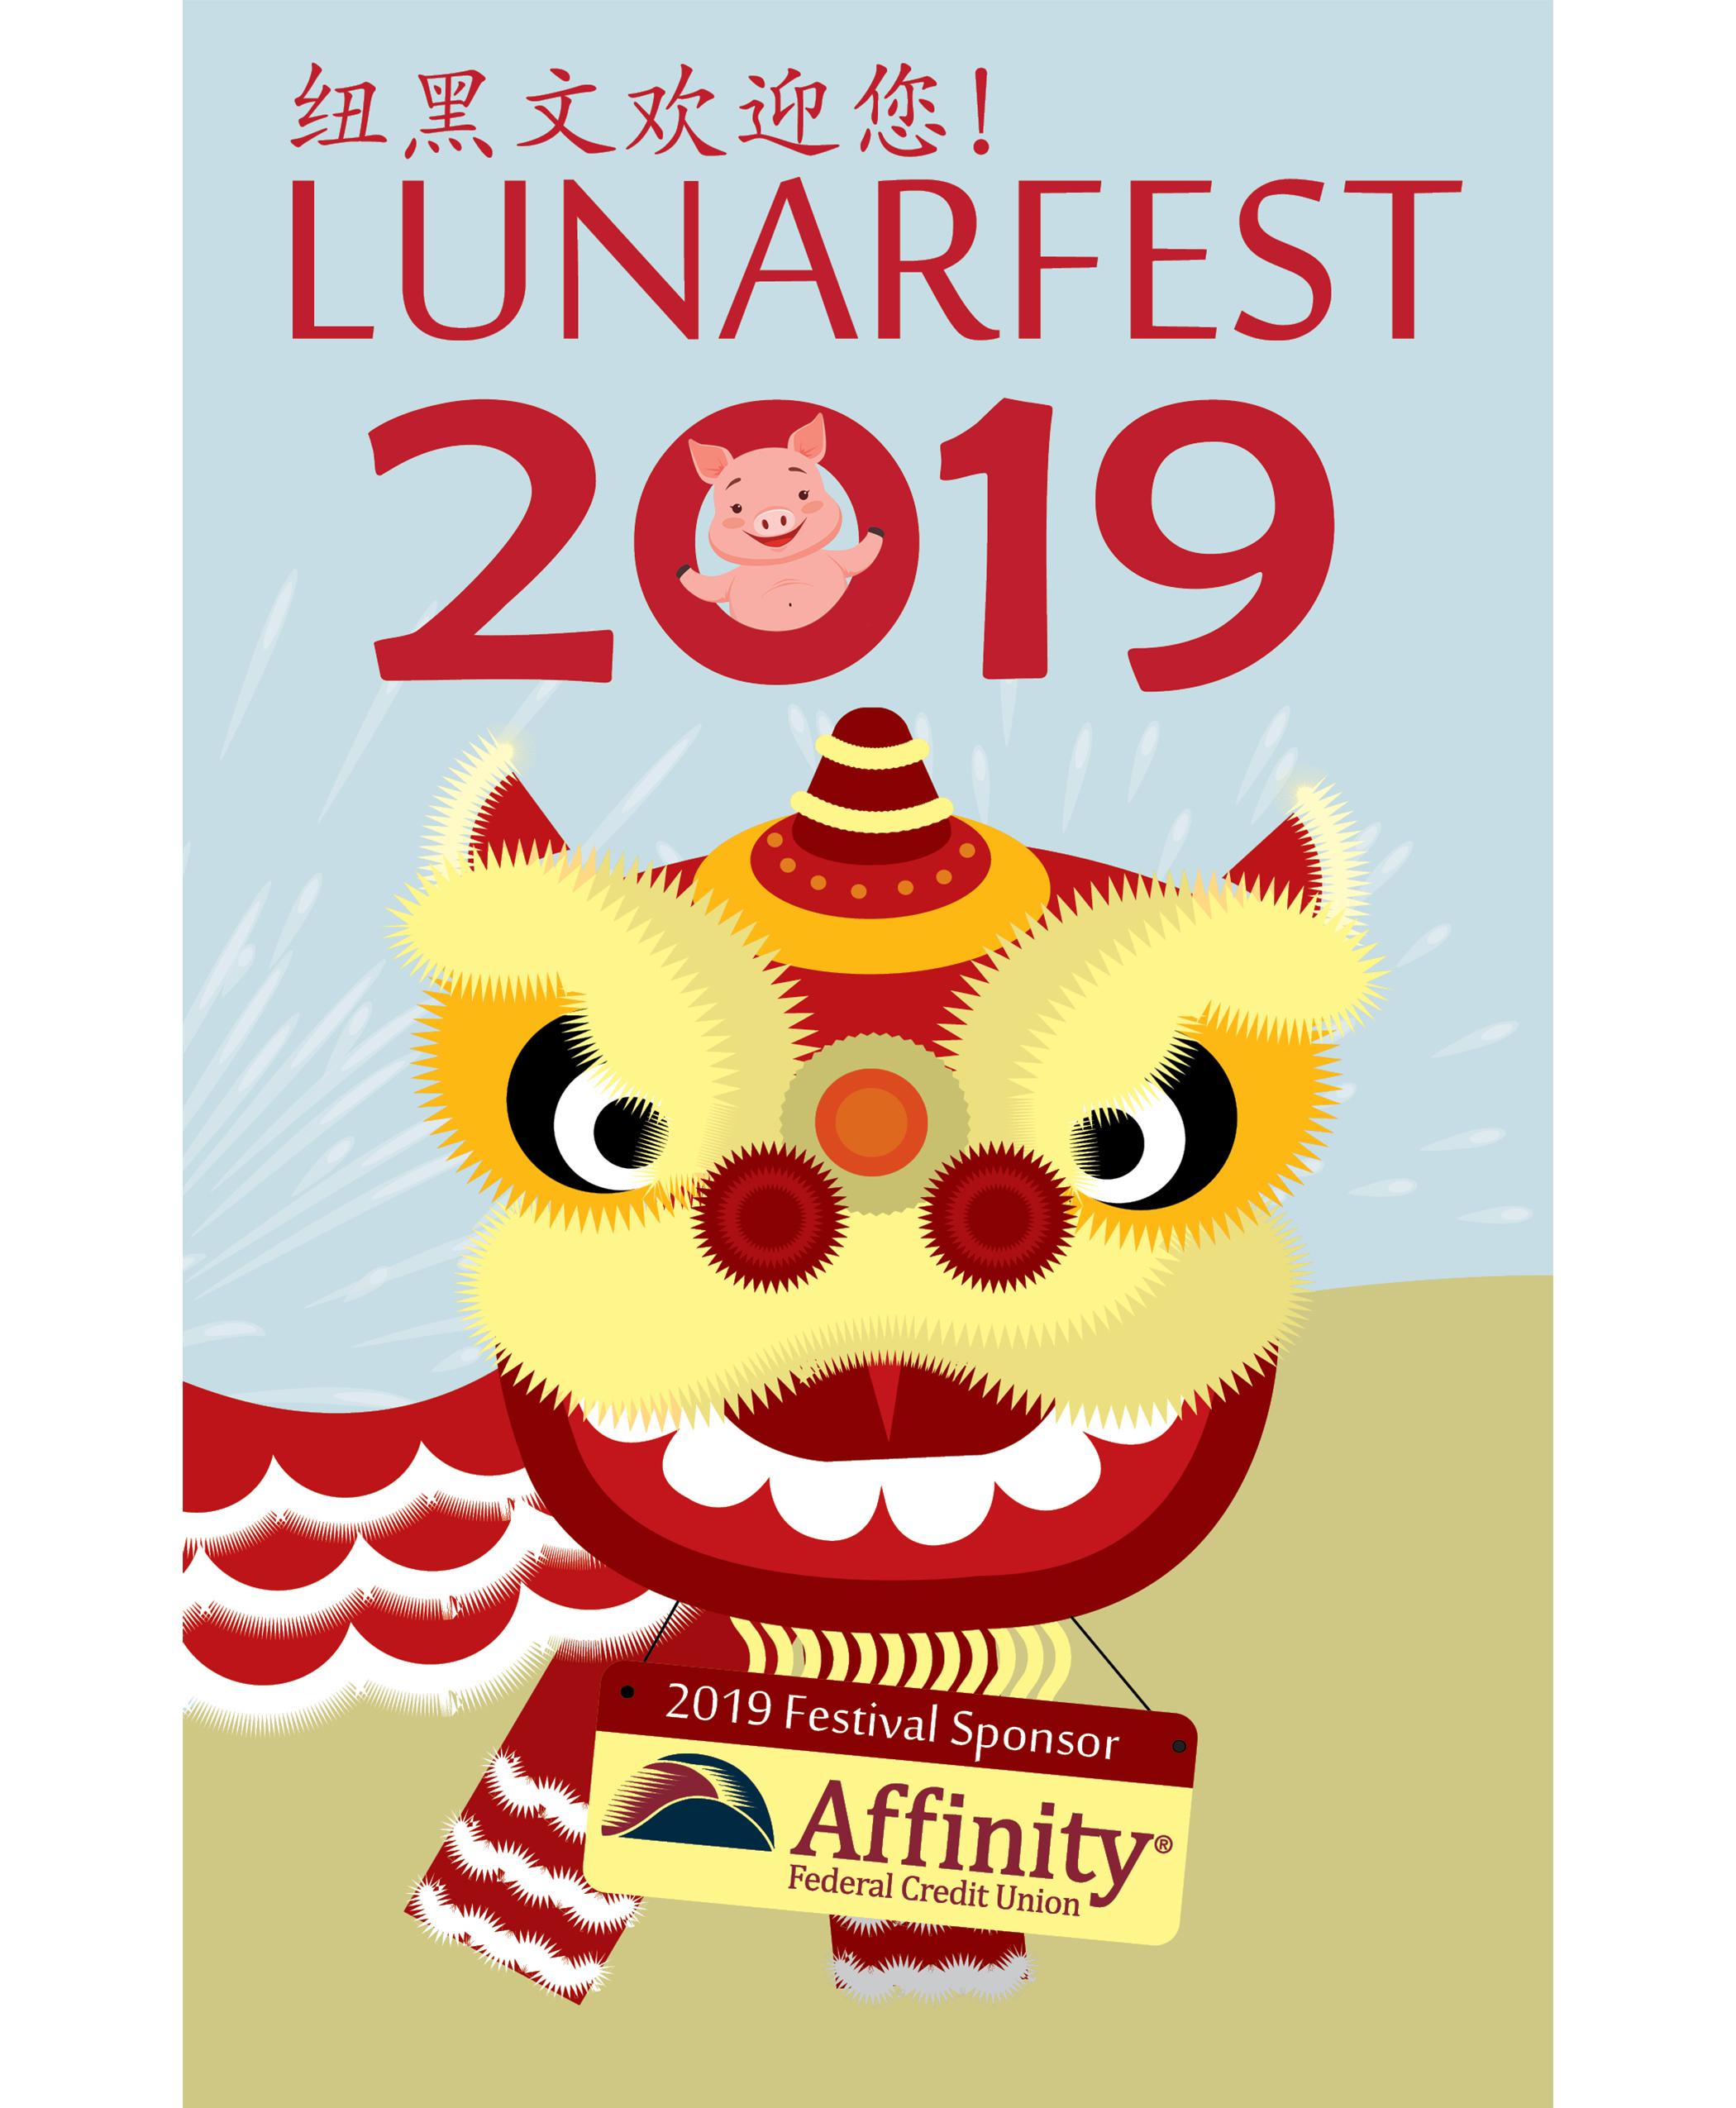 See the Lunarfest 2019 Program -